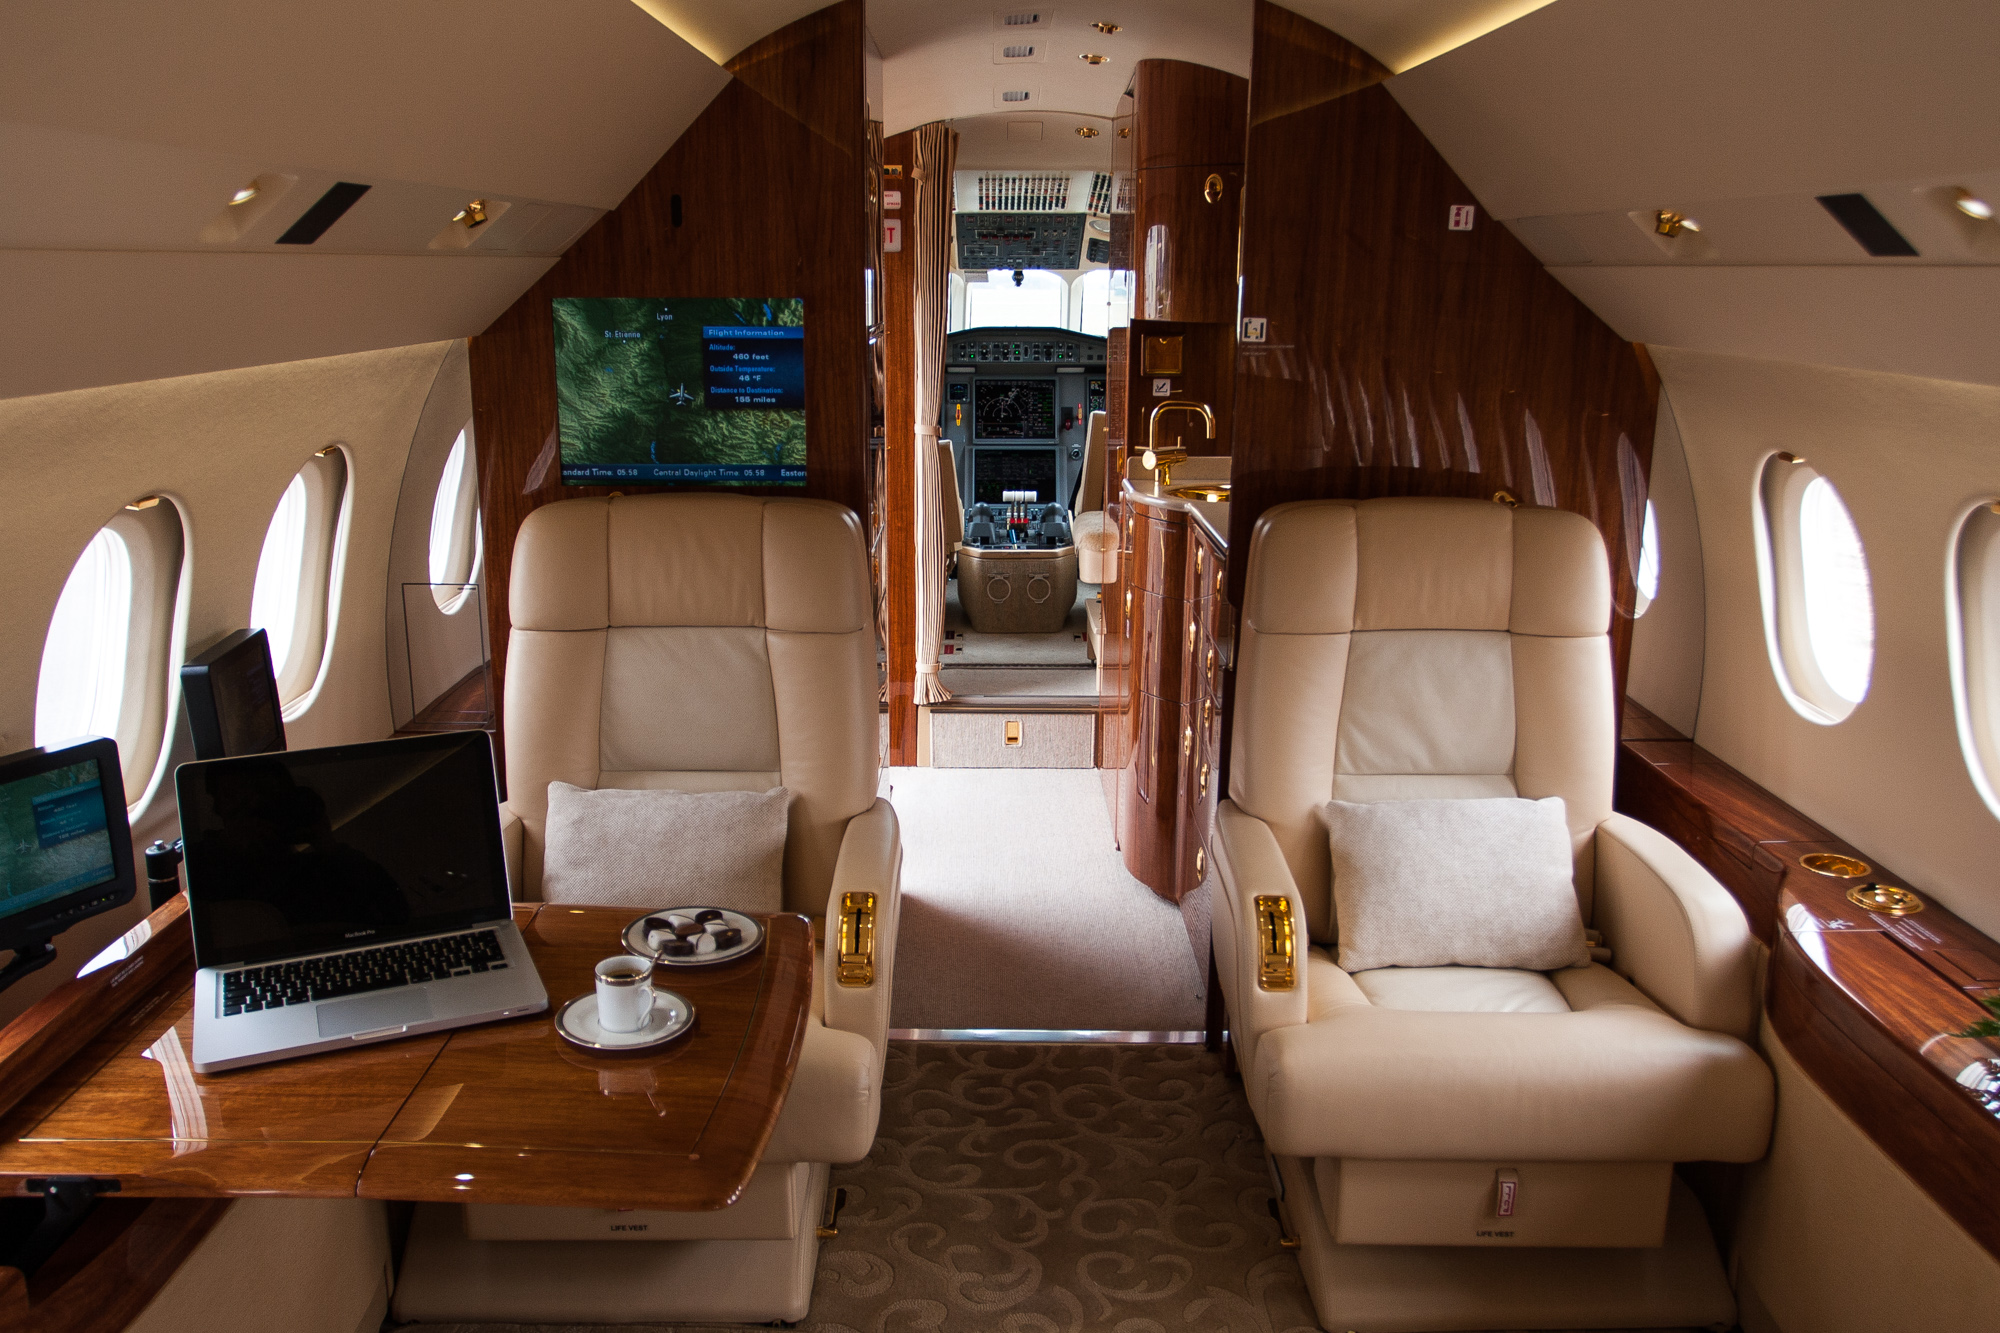 Enex Aviation-0177